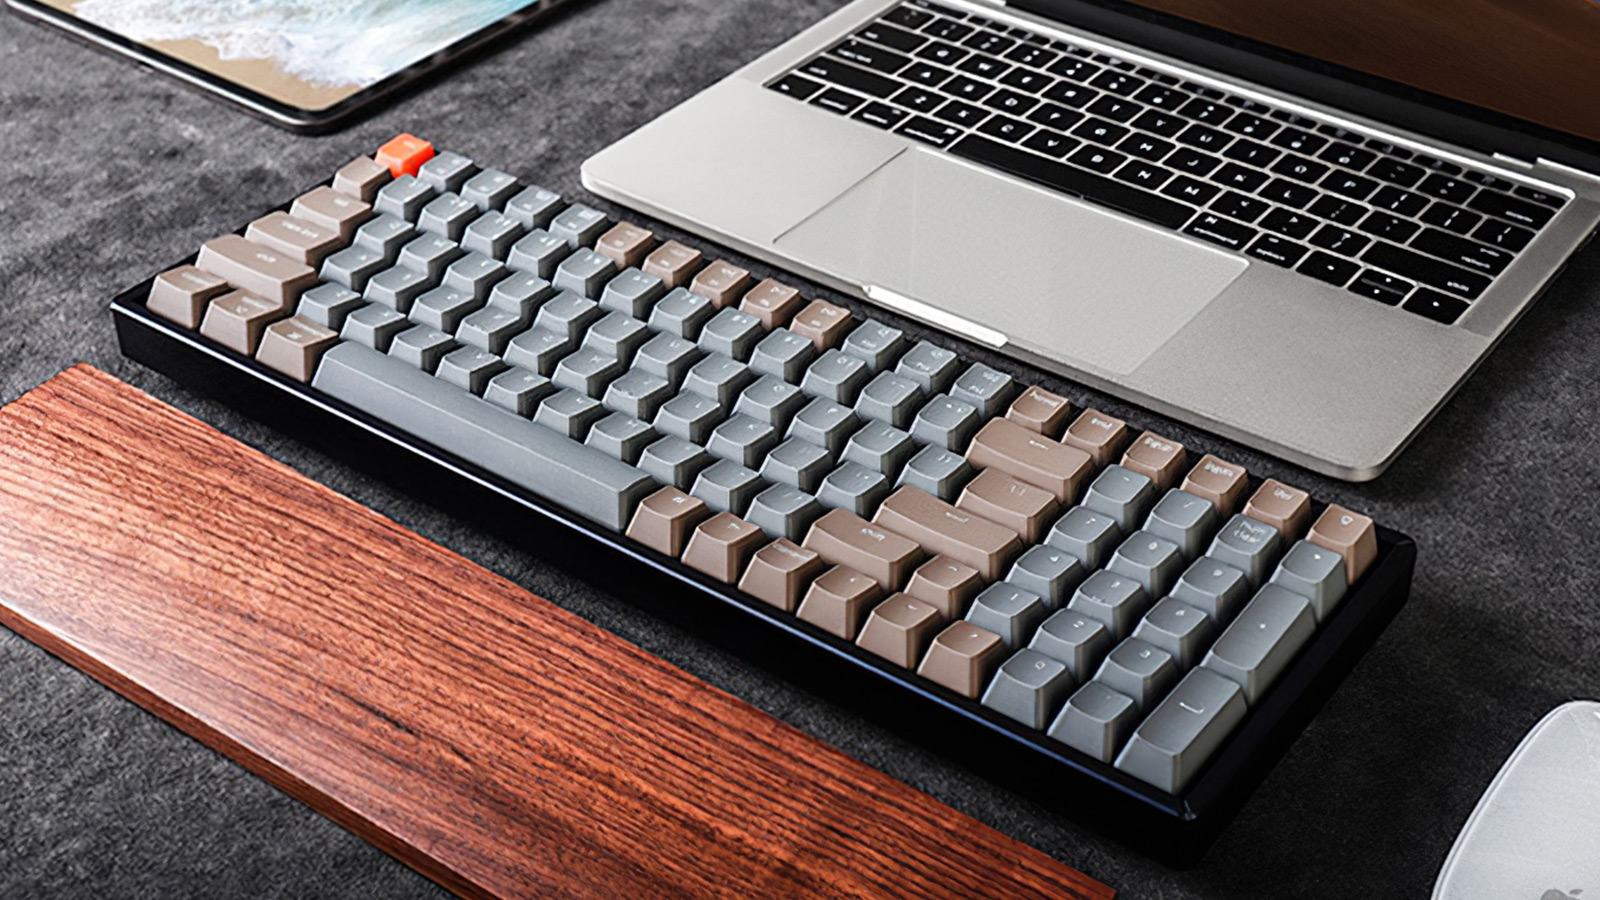 Keychron K4 Mechanical Keyboard